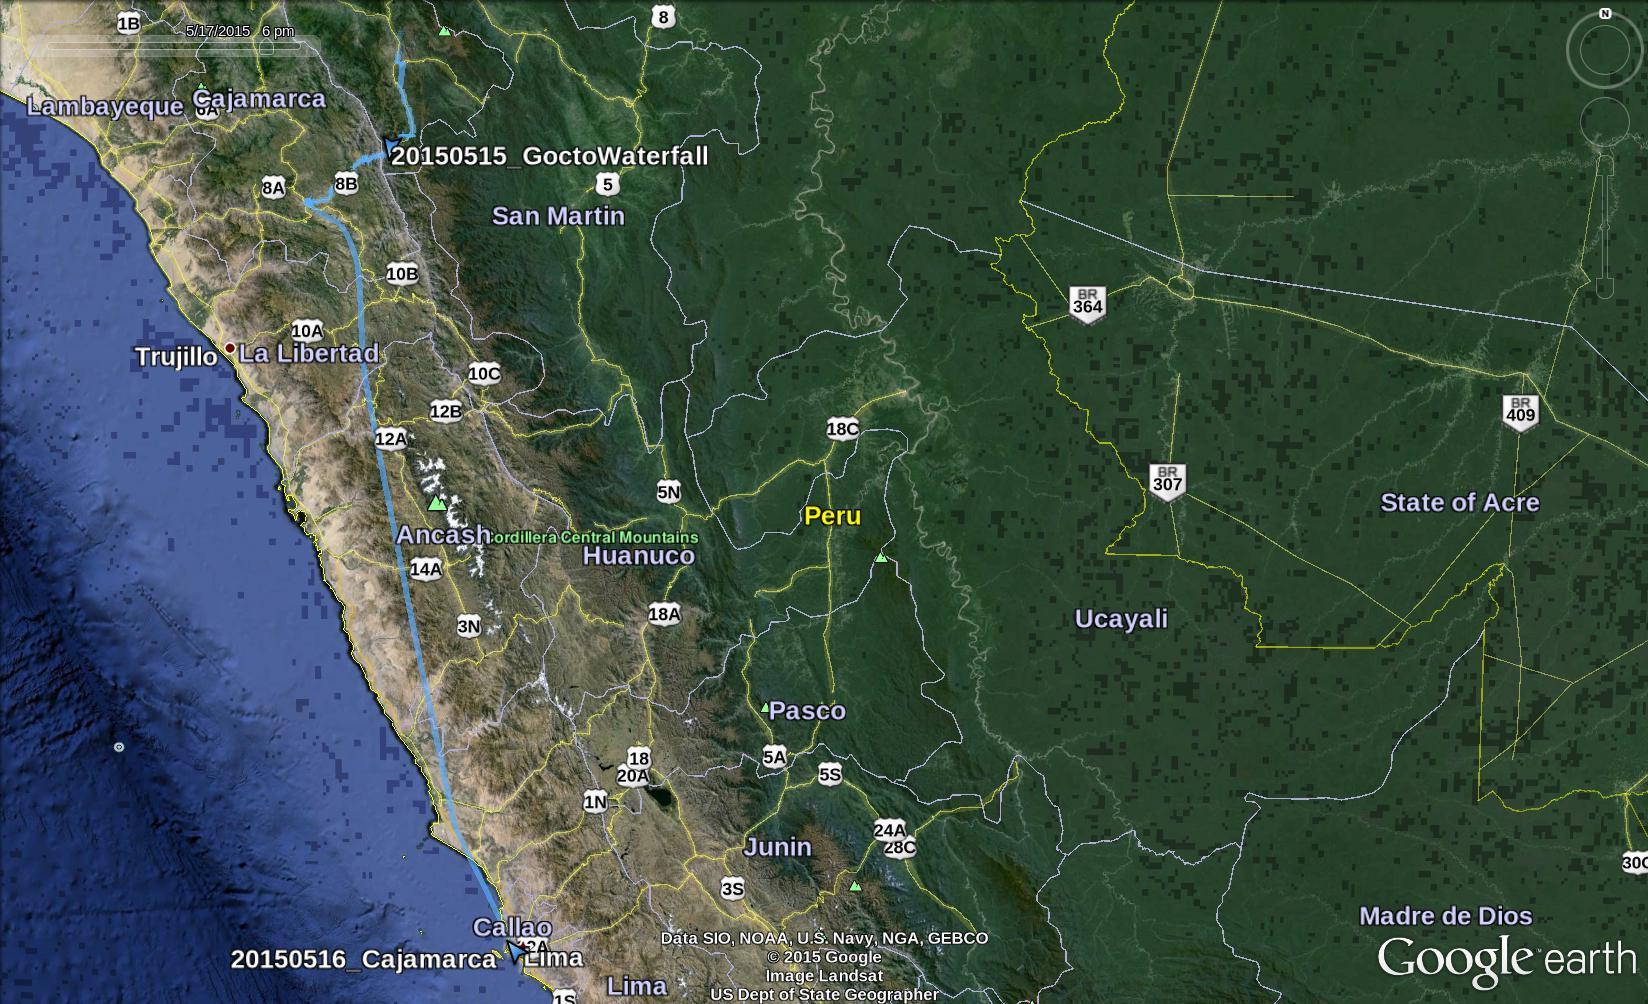 GPS Tracks from Chachapoyas to Lima via